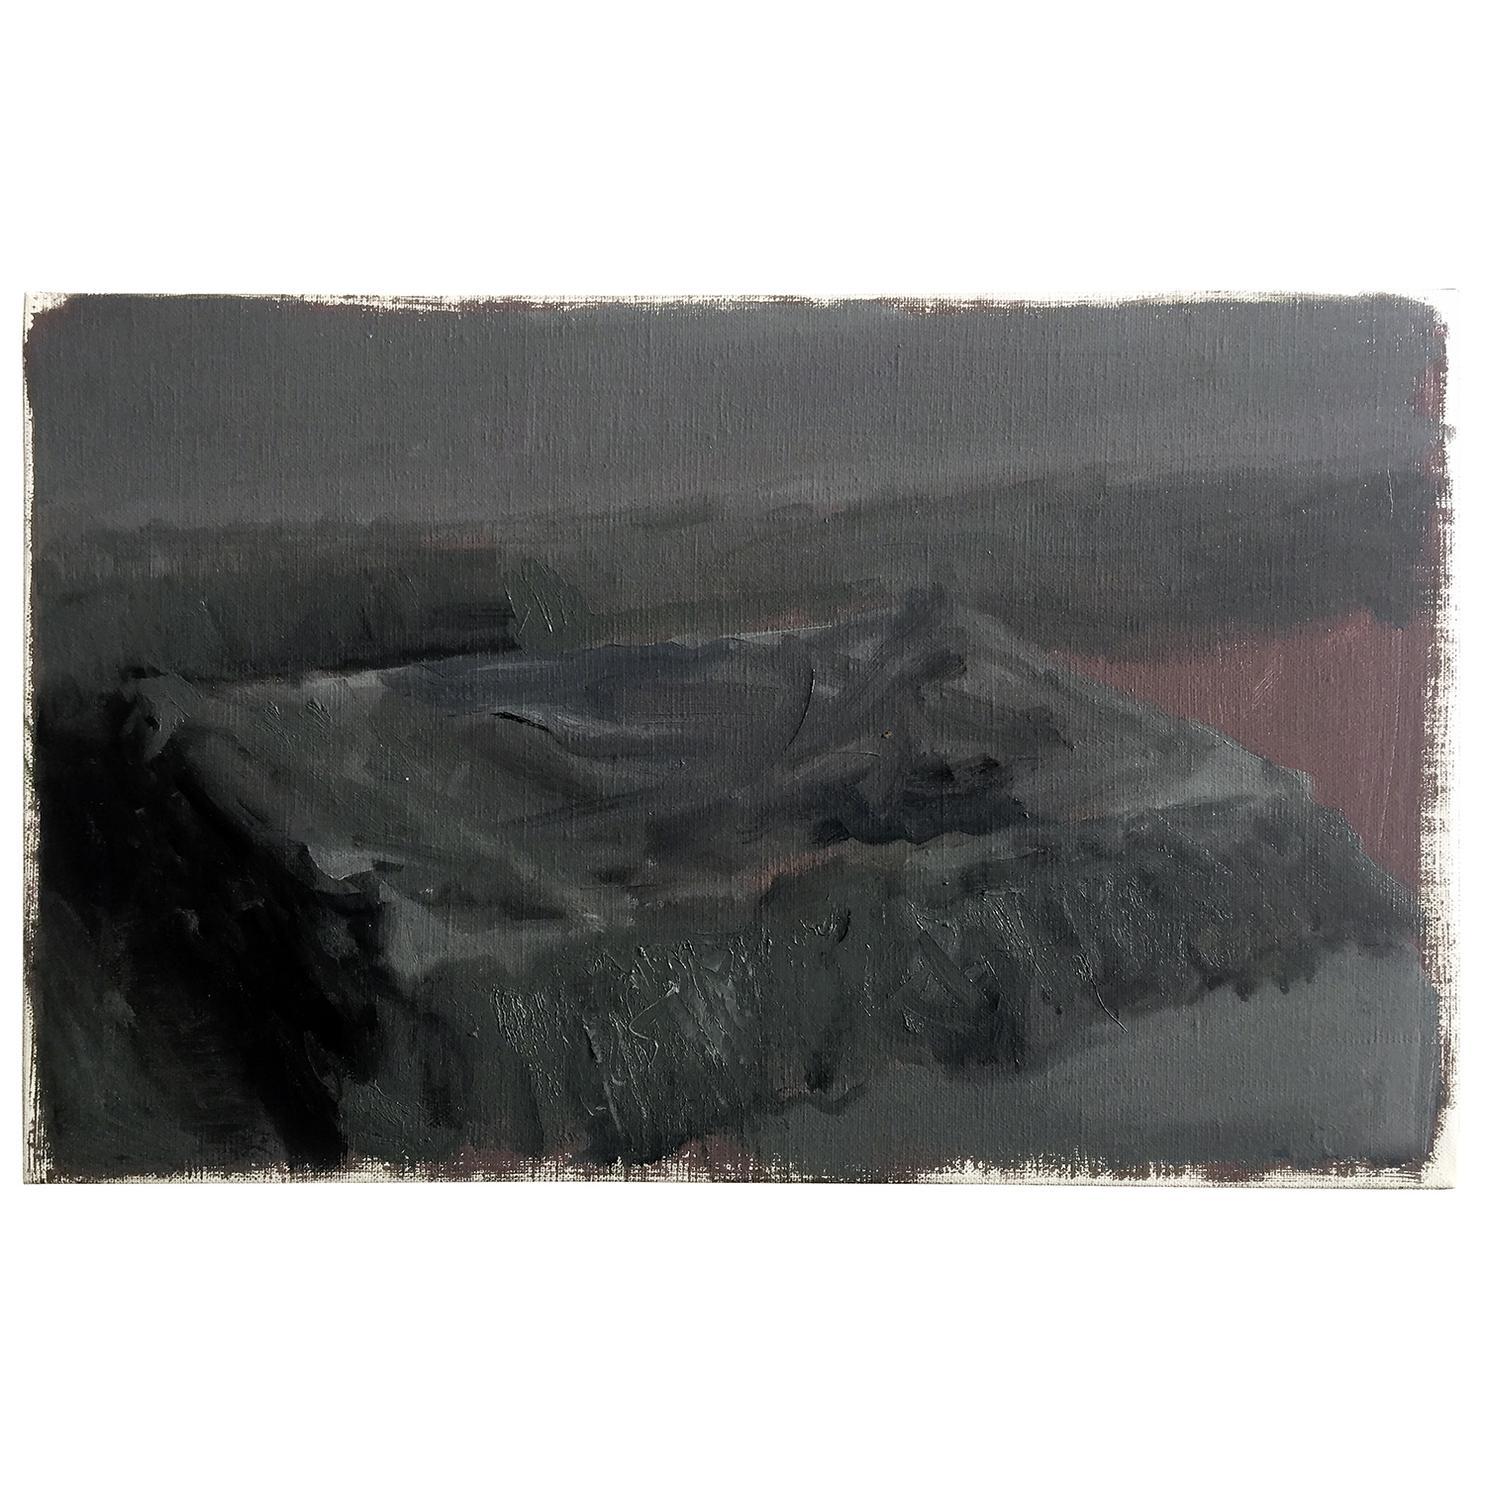 Adrian Ghenie-Stalins Tomb-2006